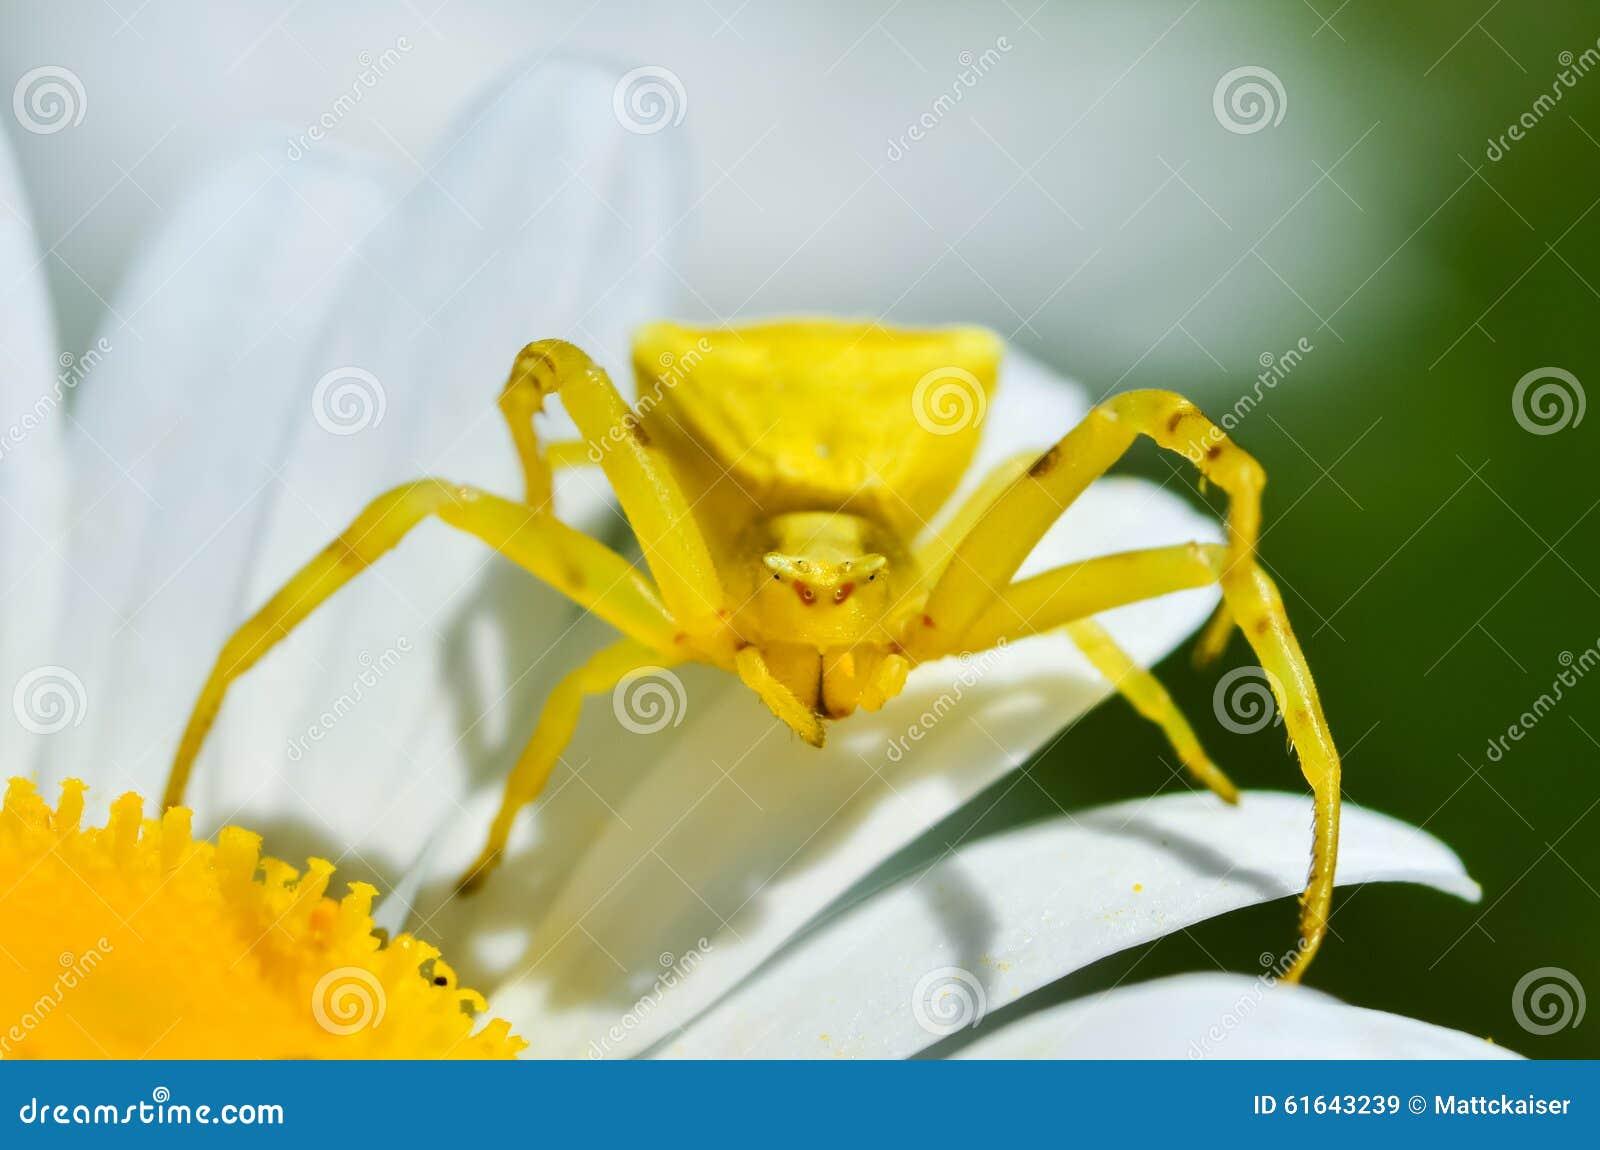 Yellow Tomisus Onustus Crab Spider On Daisy Flower Stock Photo